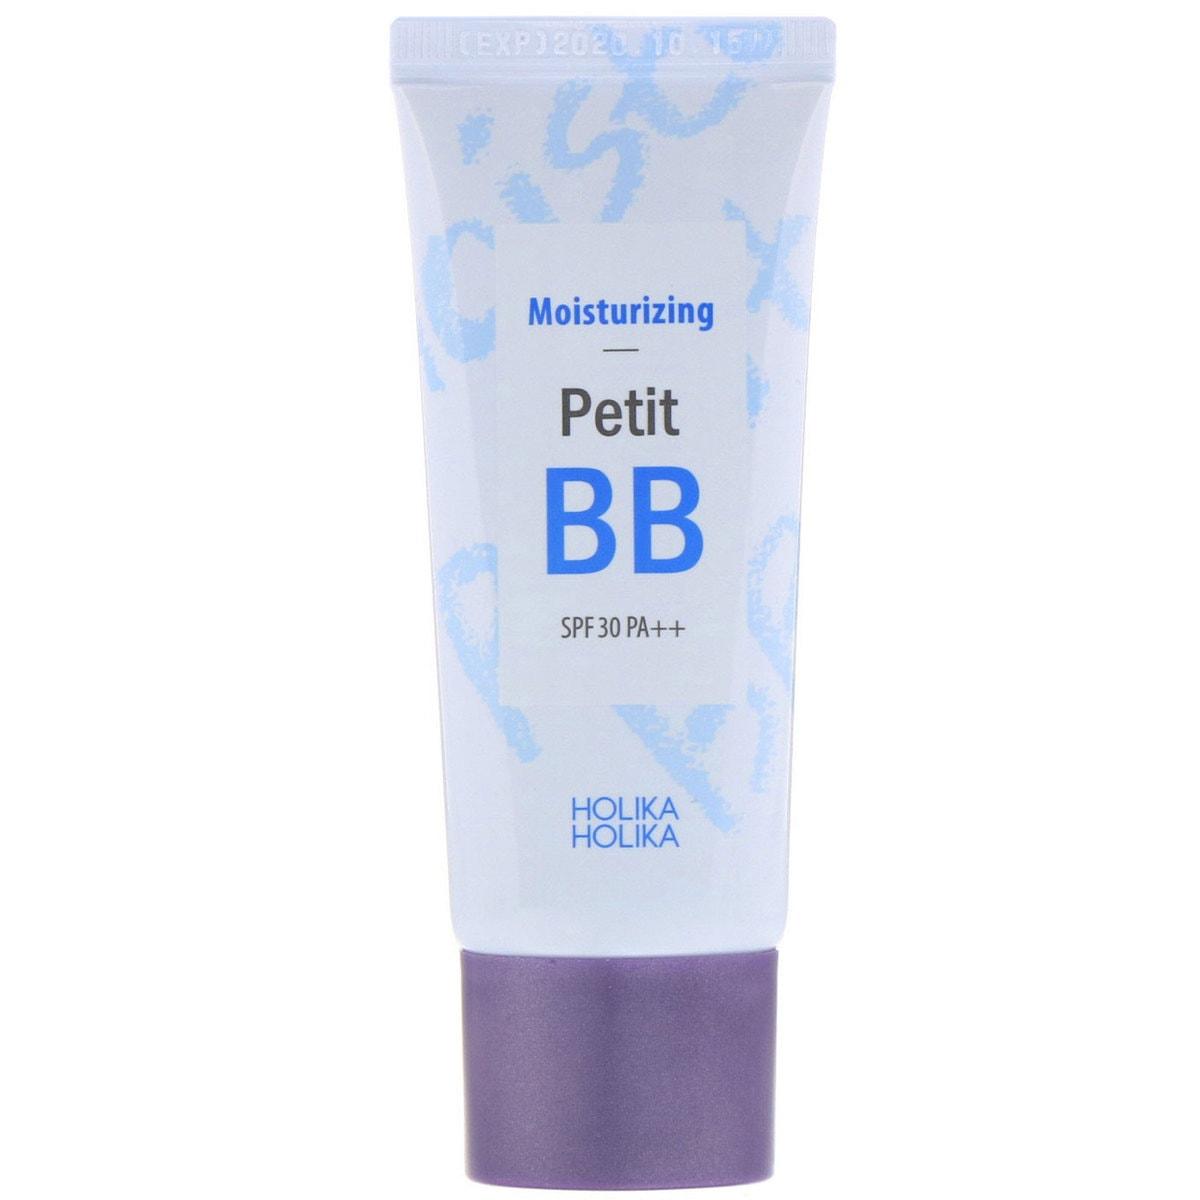 Holika Holika Moisturizing Petit BB Cream